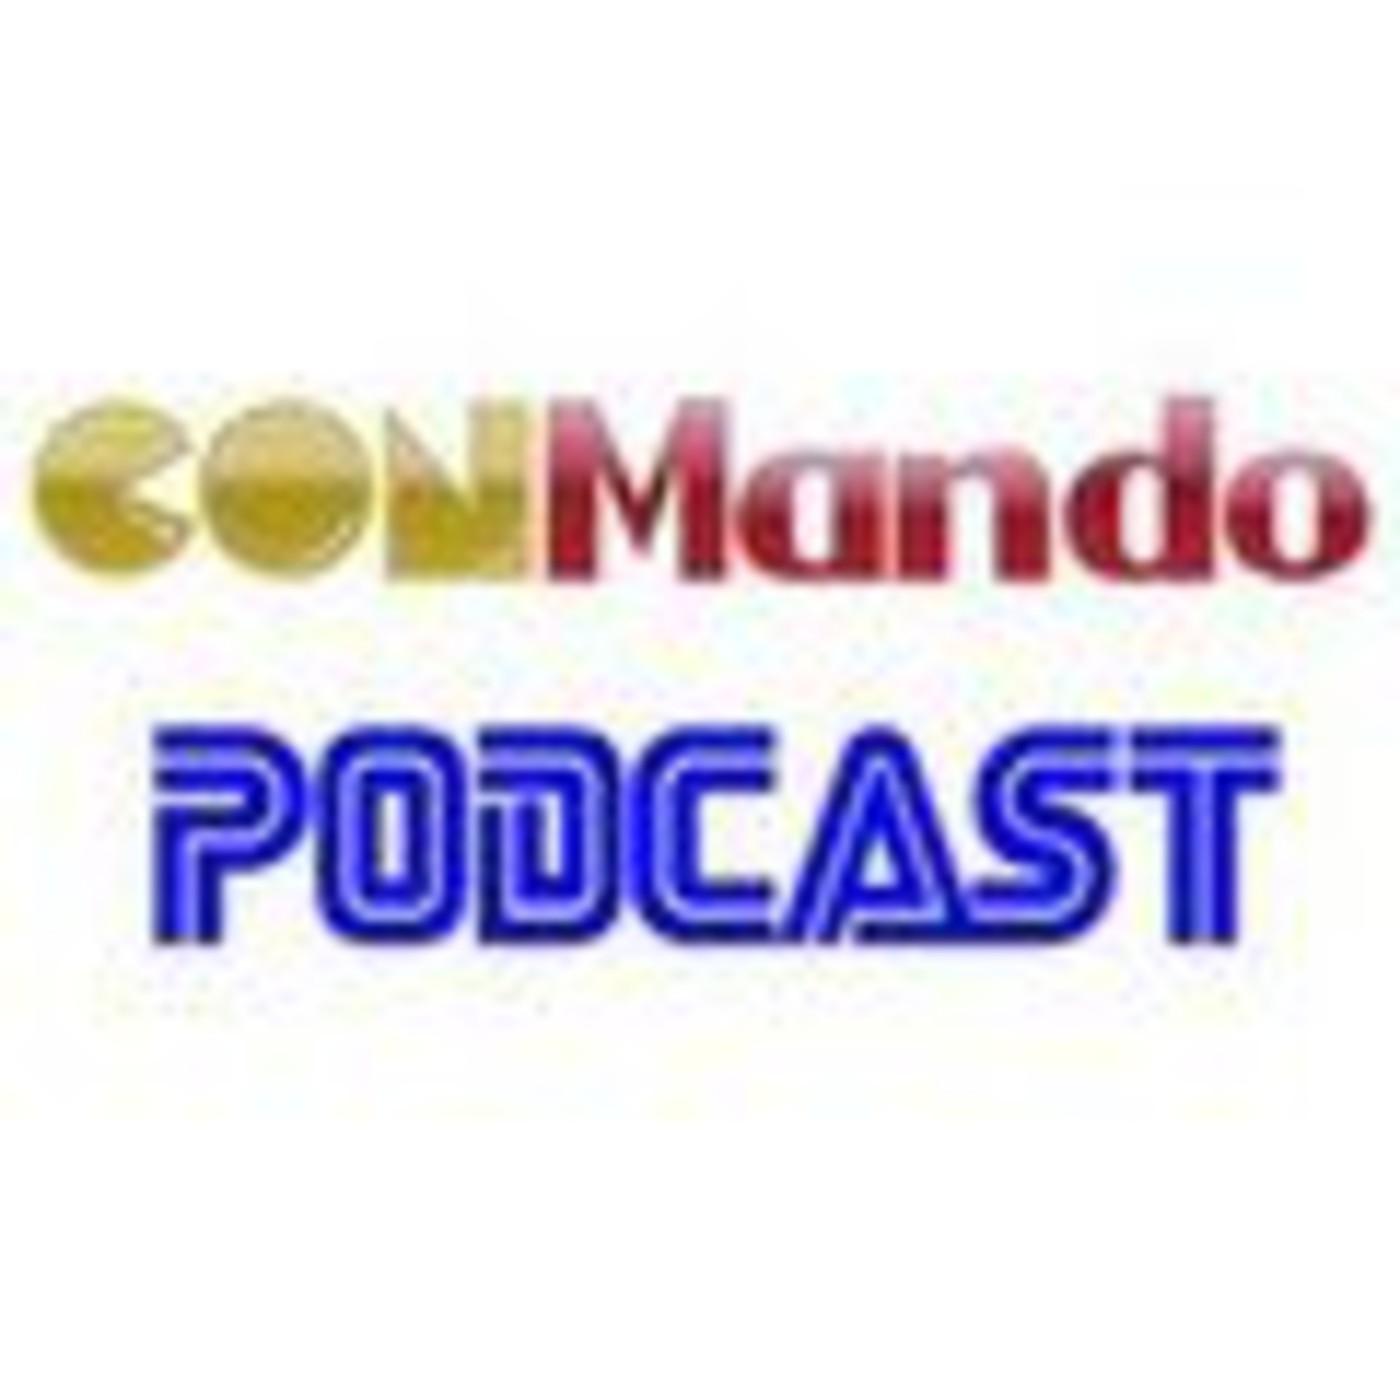 ConmandoPodcast